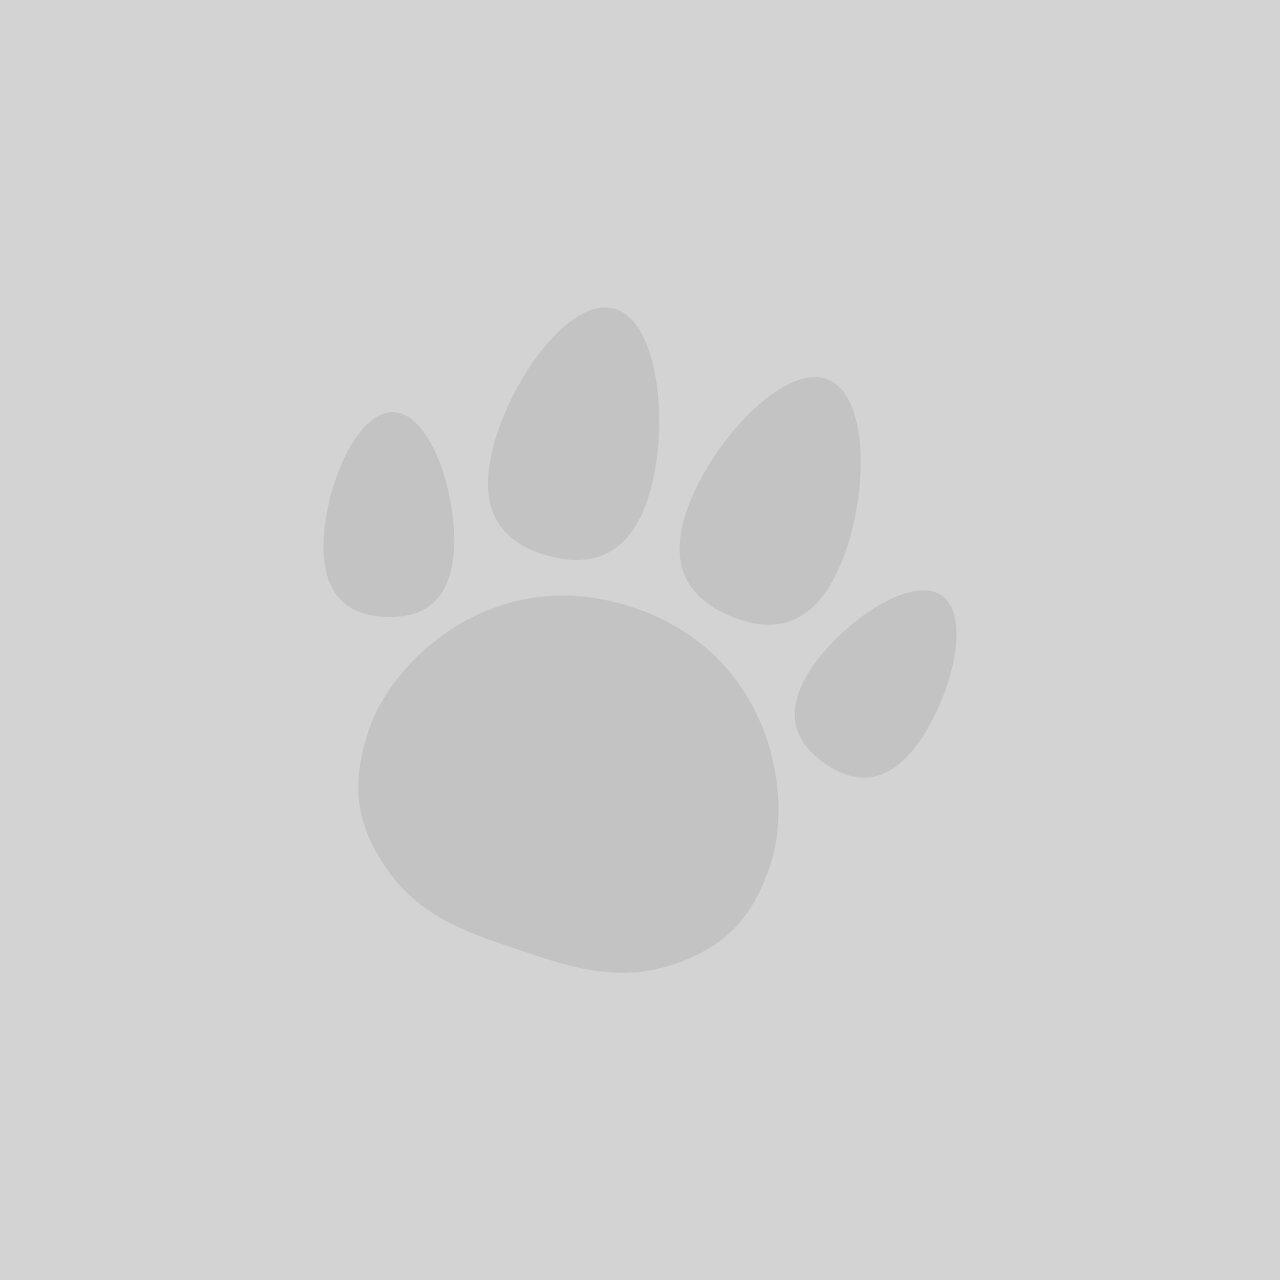 Iams Puppy & Junior Dry Dog Food Small/Medium 3kg